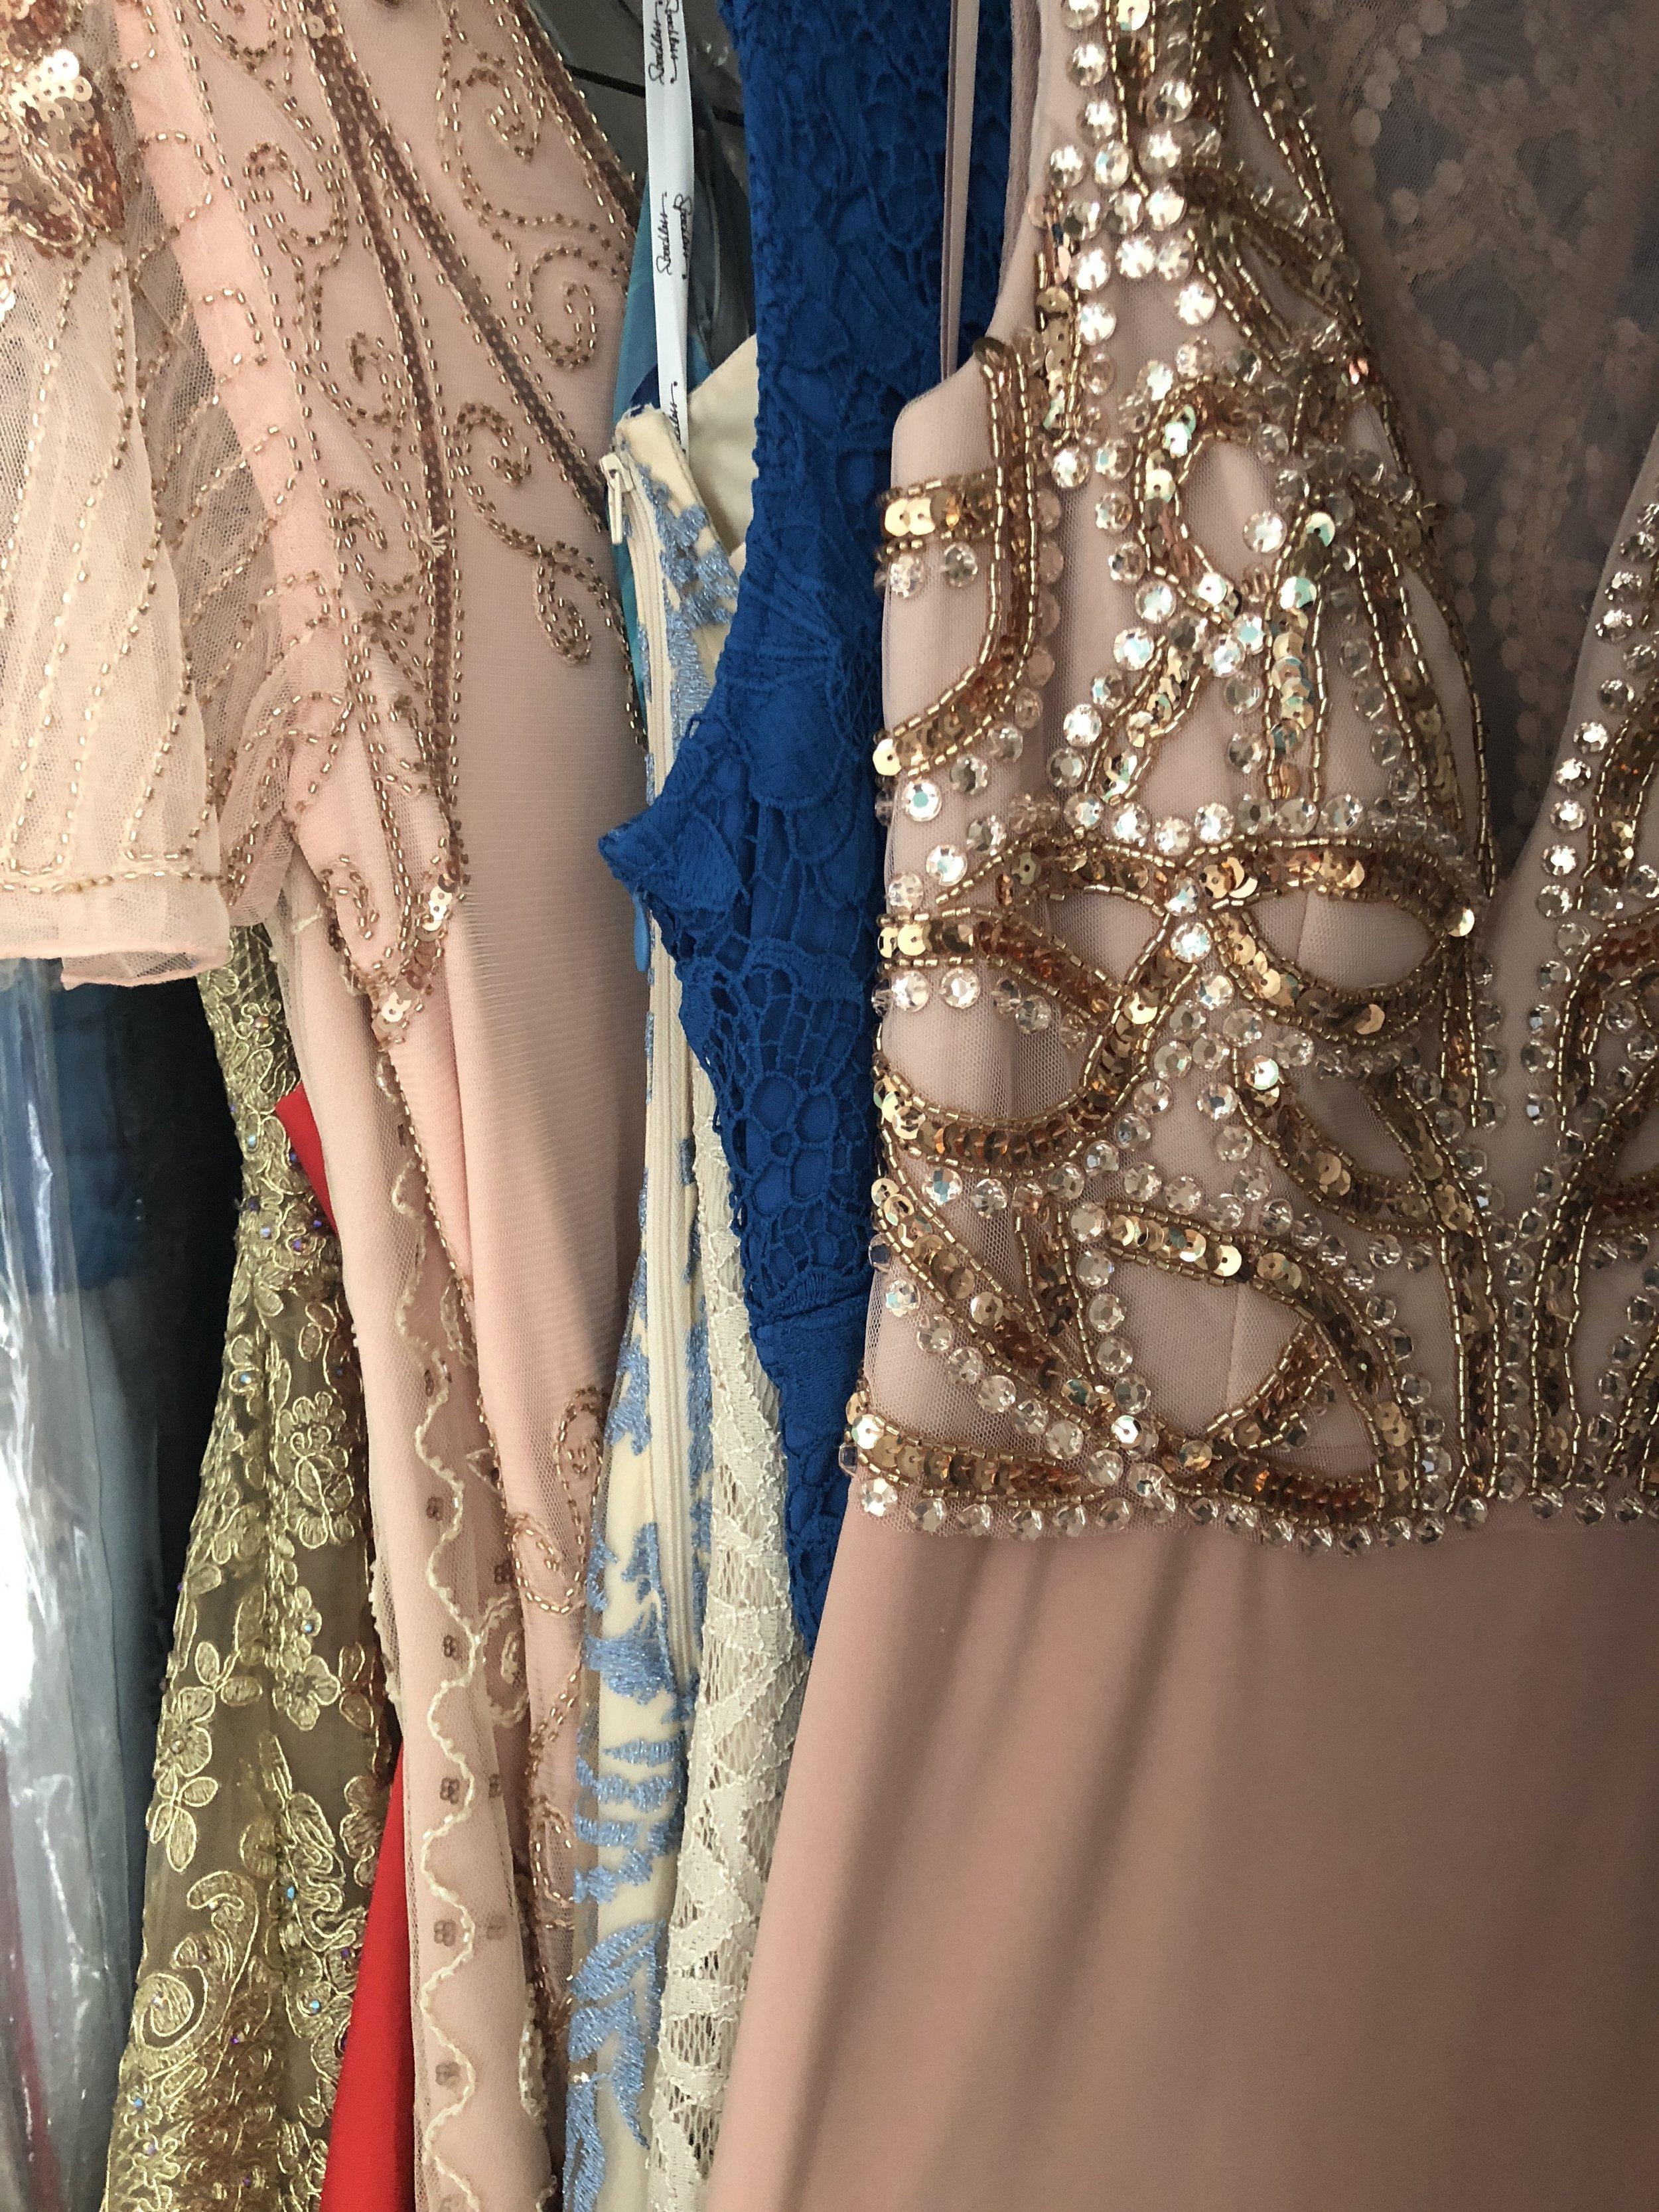 Senior Style Closet